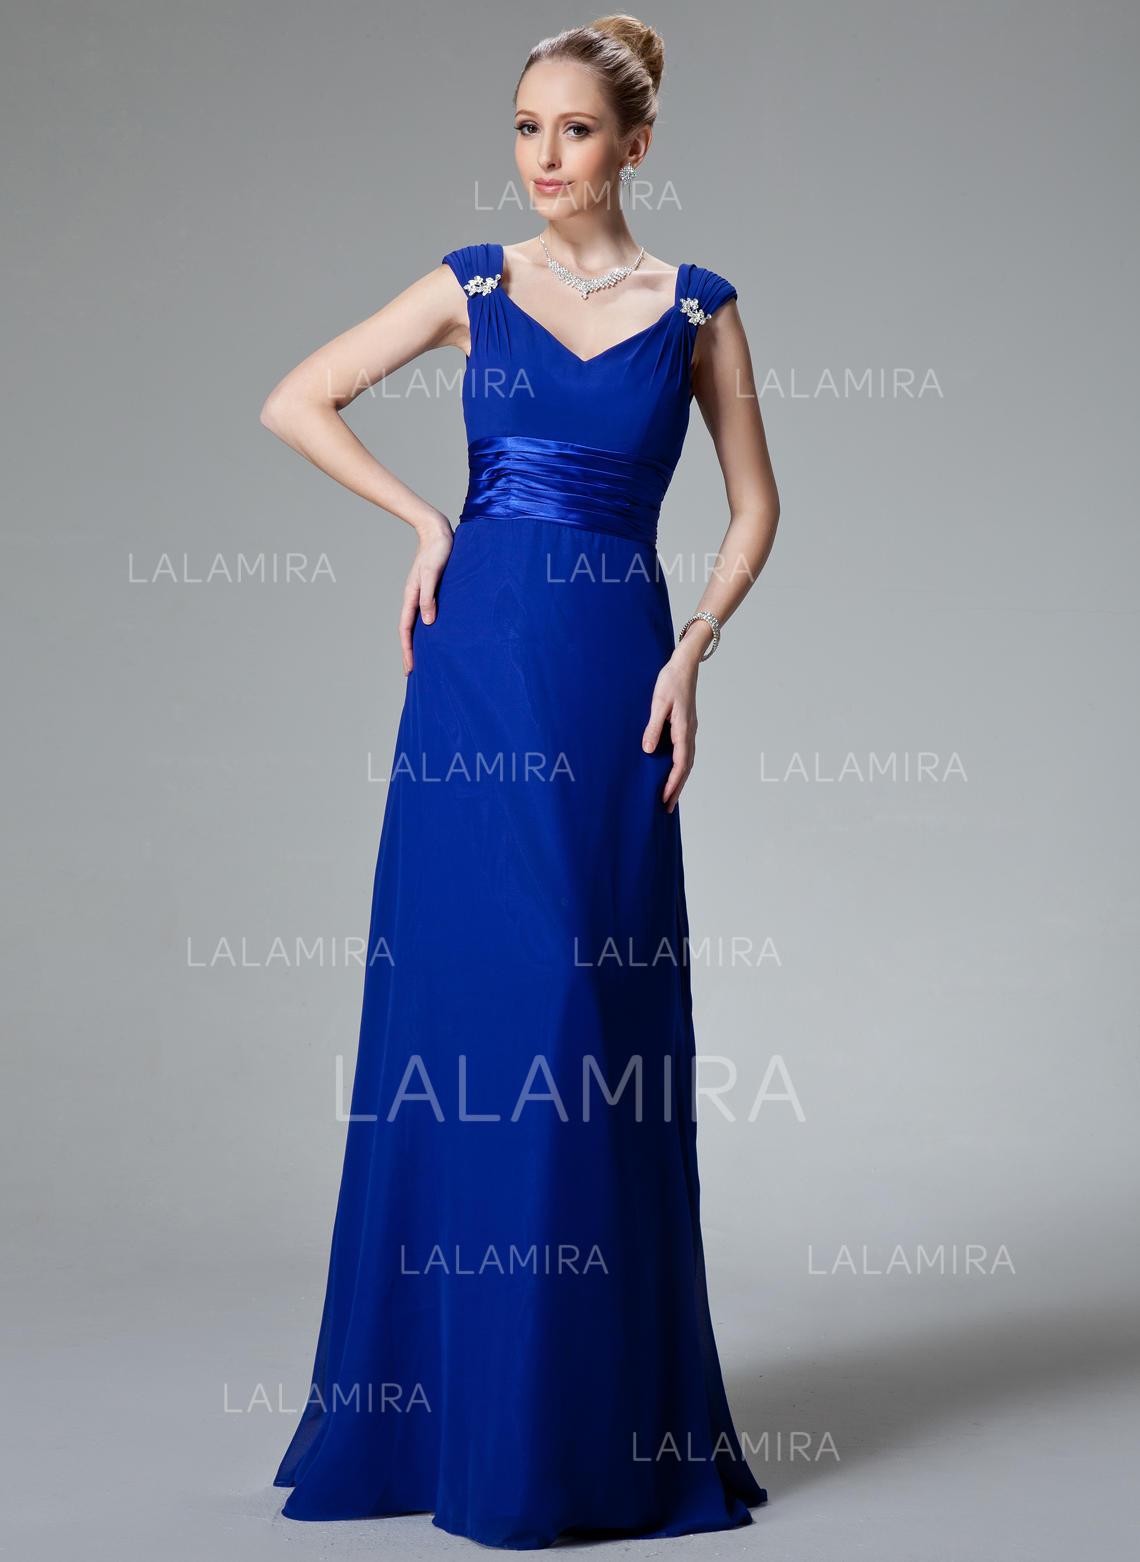 c50d0a4954f5 A-Line/Princess Chiffon Charmeuse Bridesmaid Dresses Ruffle Beading V-neck  Sleeveless Floor. Loading zoom